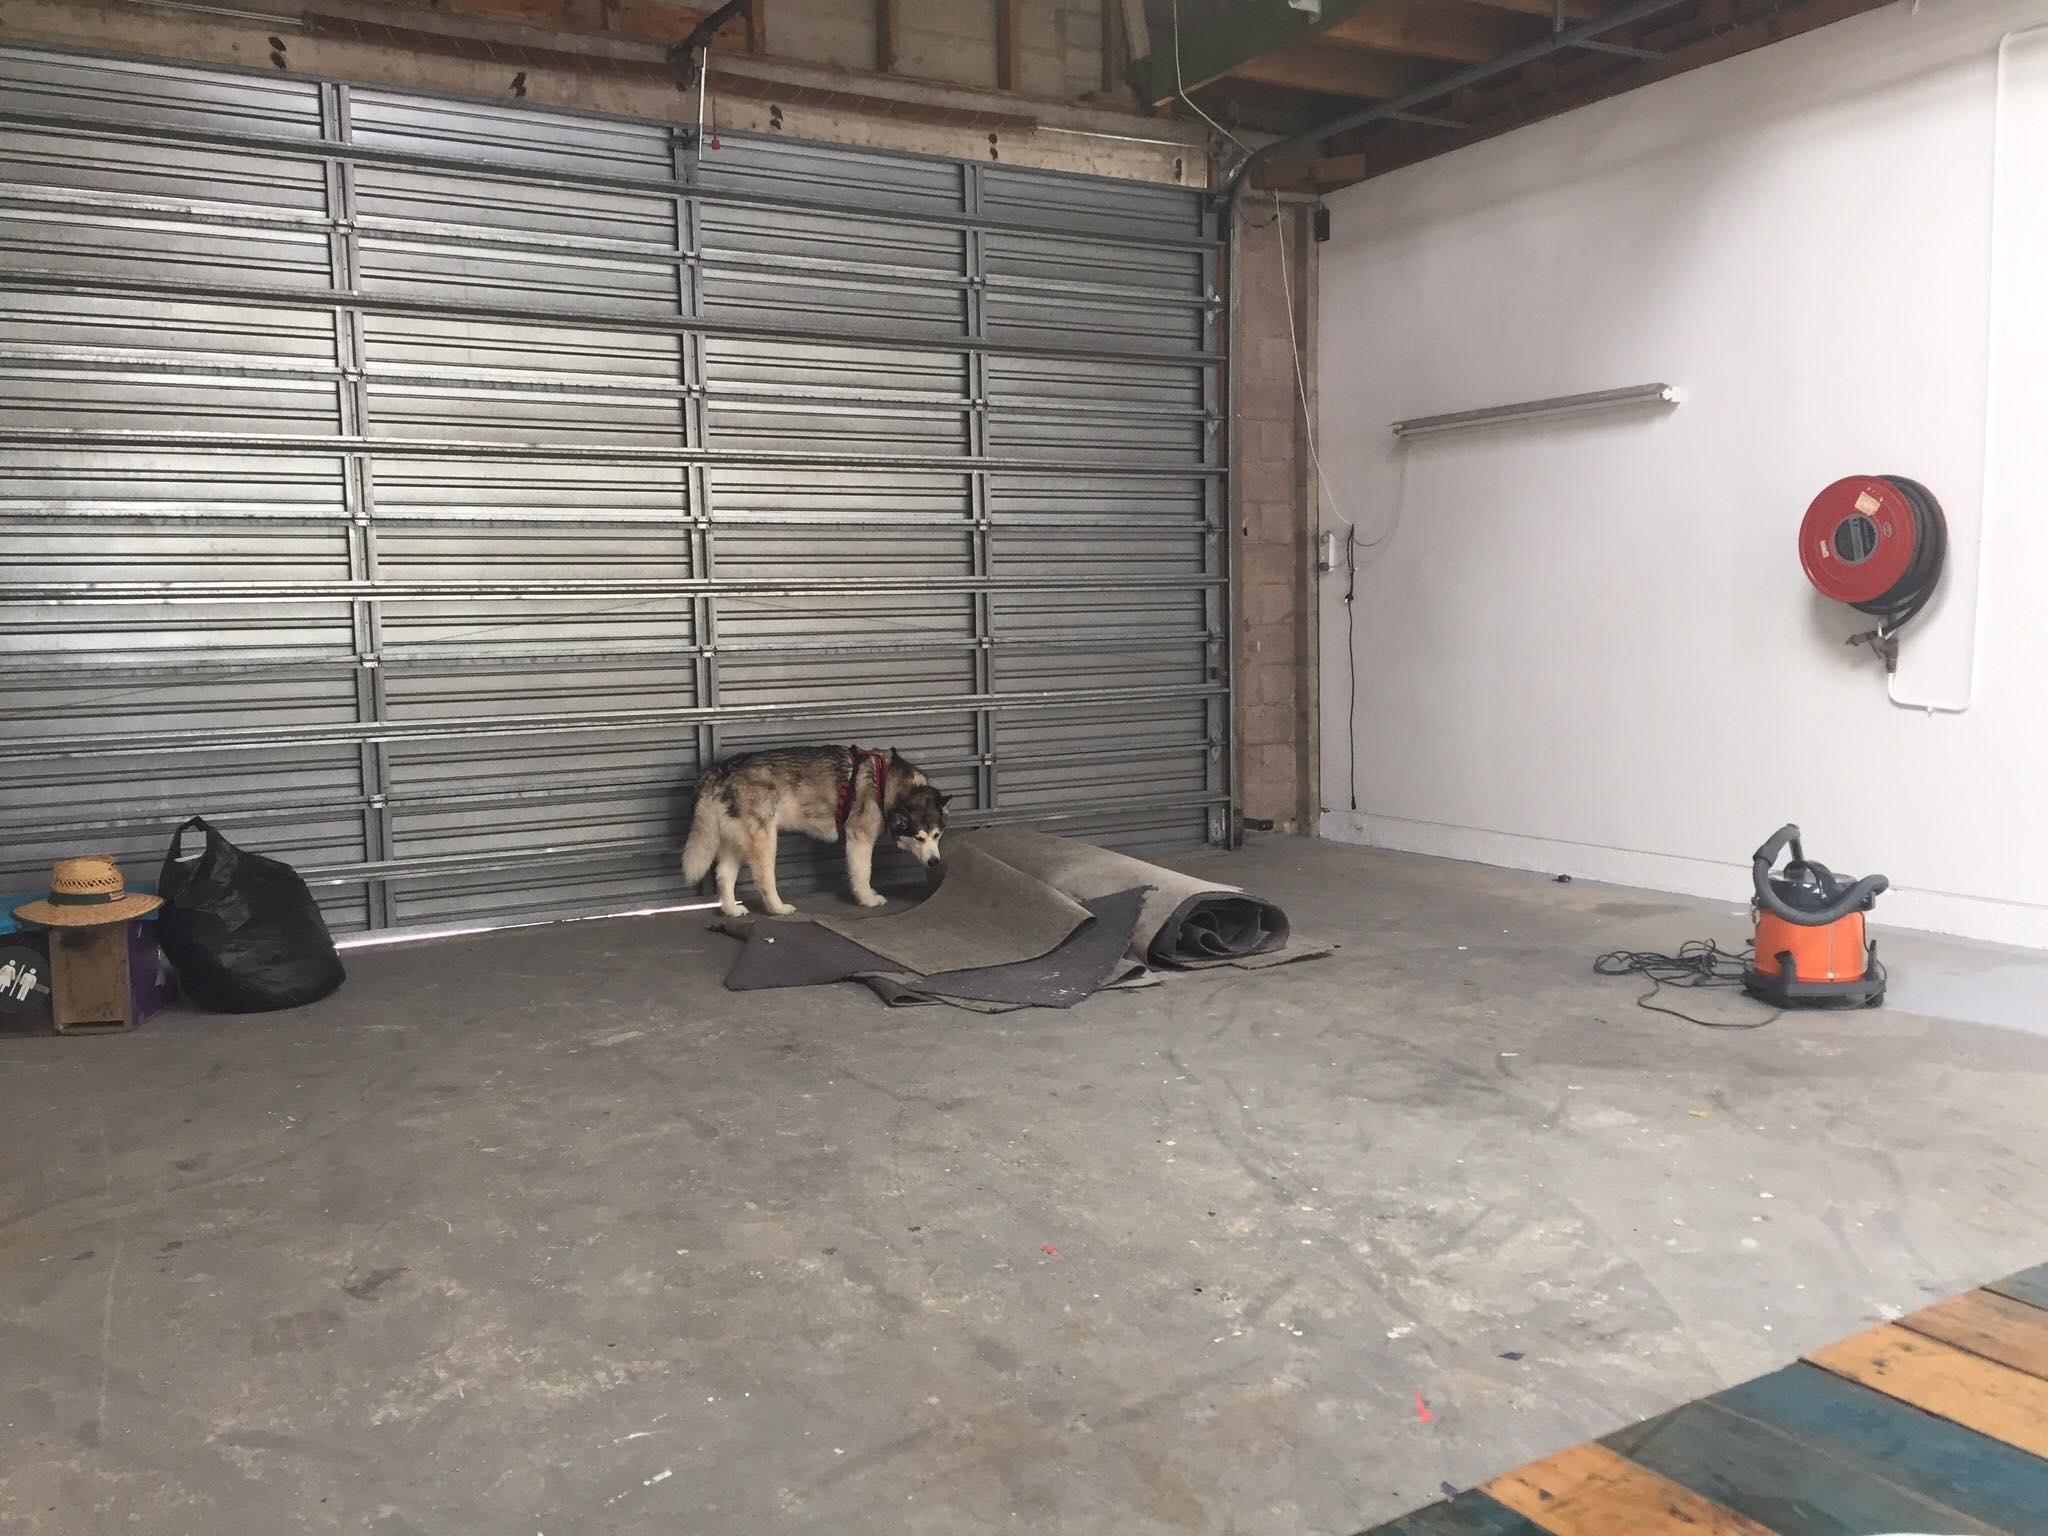 dog-checks-out-new-facility.jpg